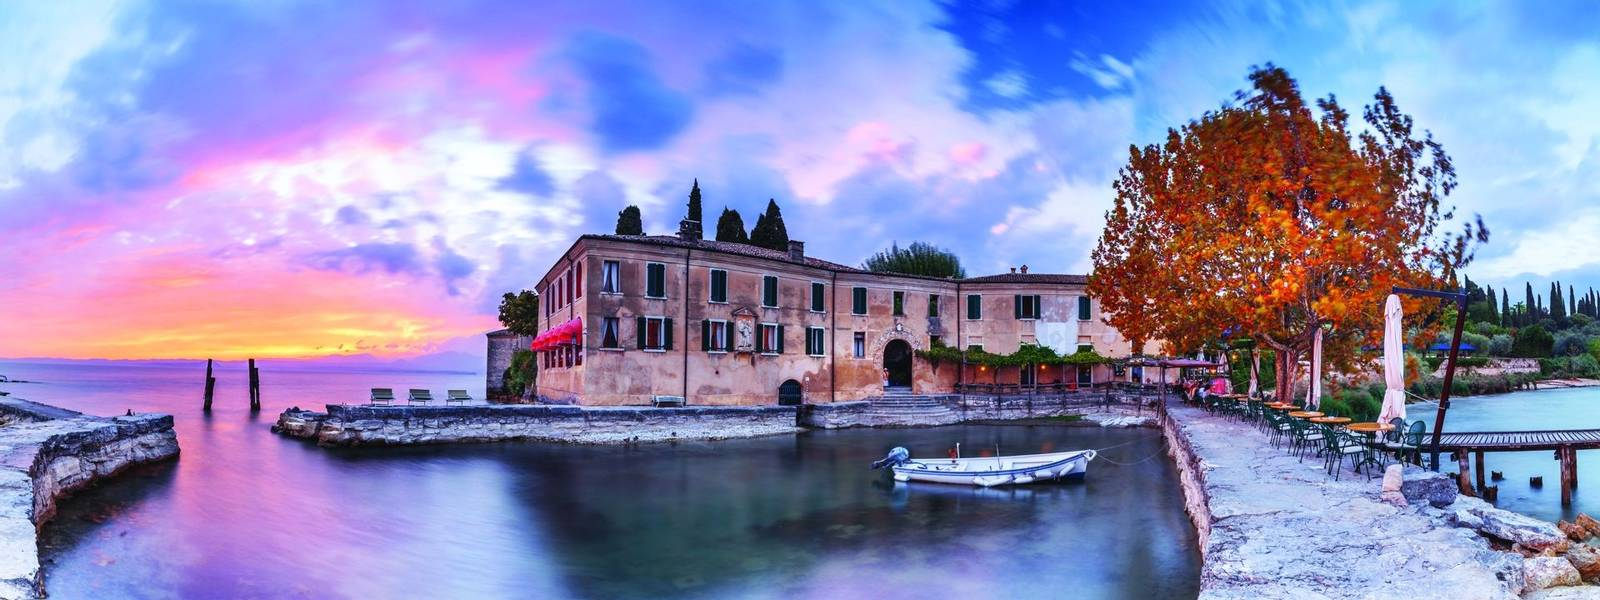 Italy-Lake-Garda-Sunset AdobeStock_120153960.jpg